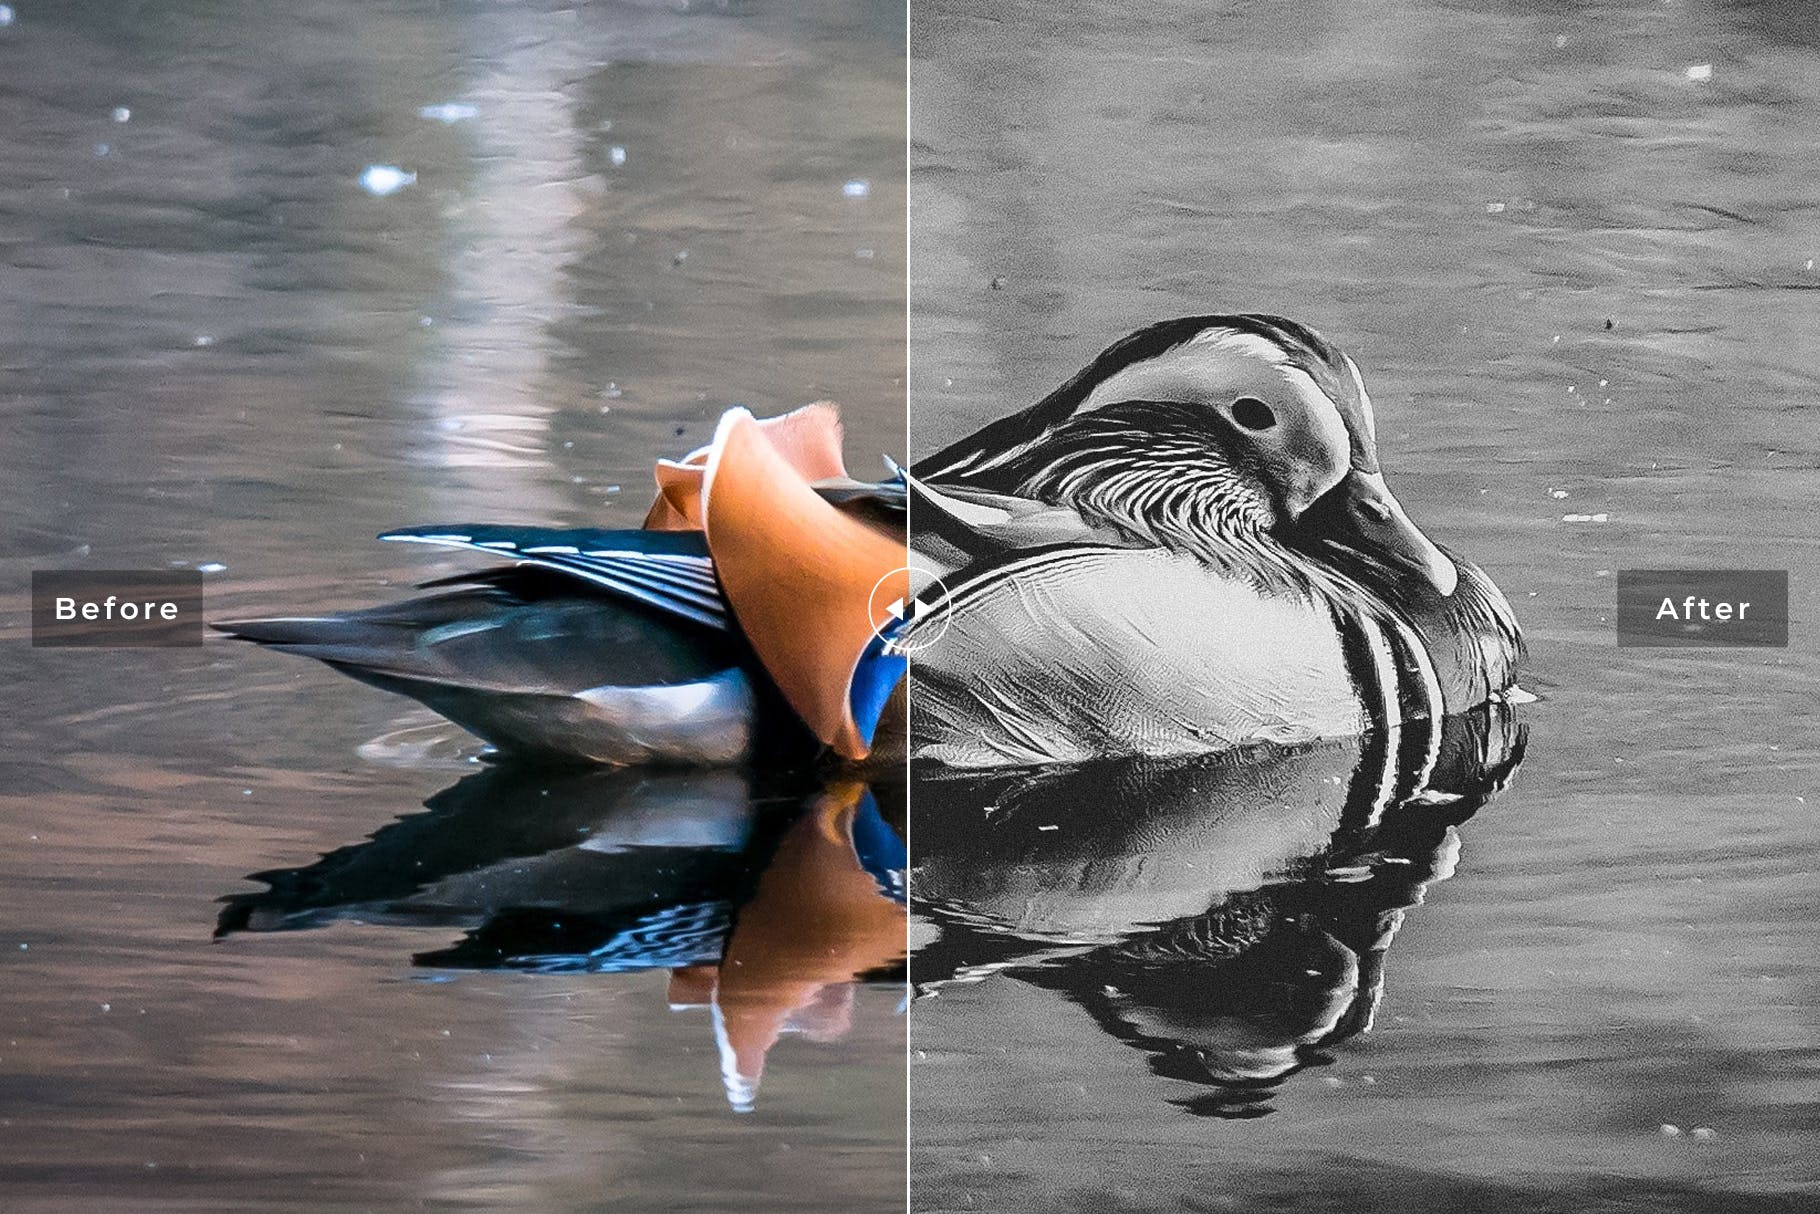 鸟类摄影优化照片效果处理LR预设Birds Wings Mobile Desktop Lightroom Presets插图(4)